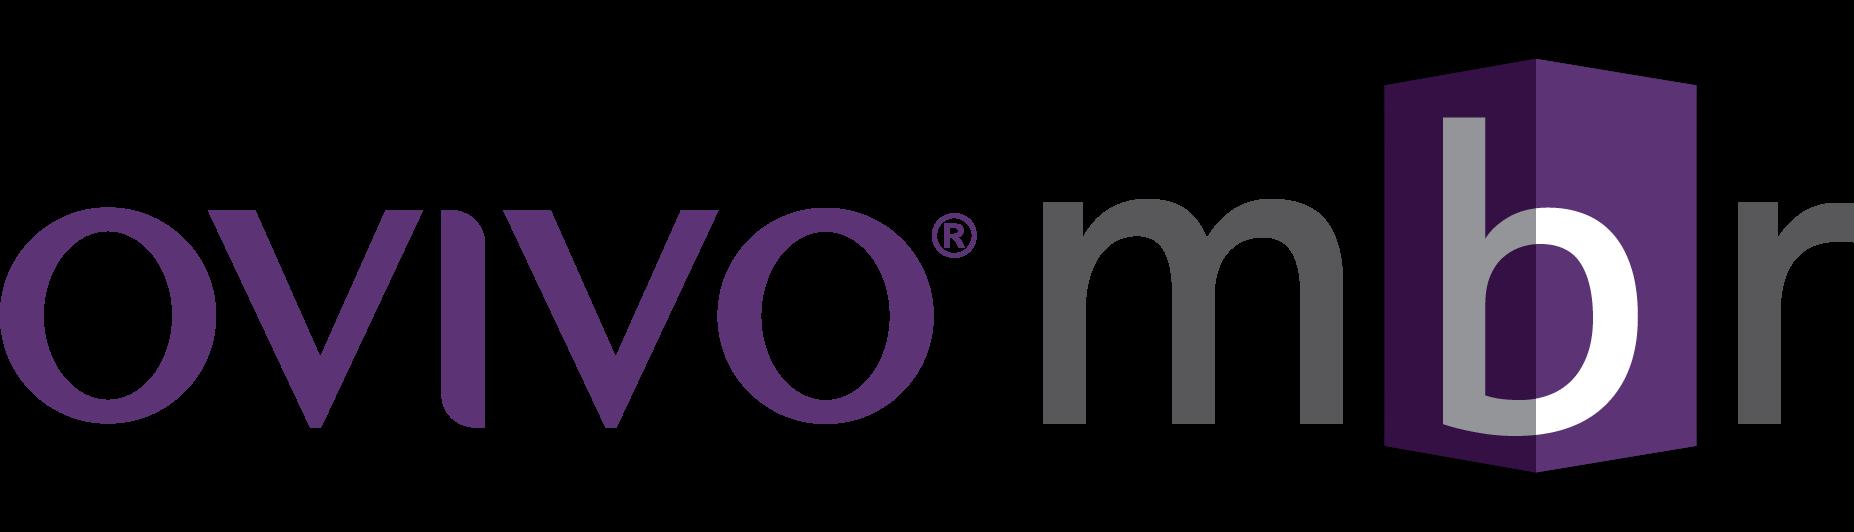 OVIVO®  - MBR Systems